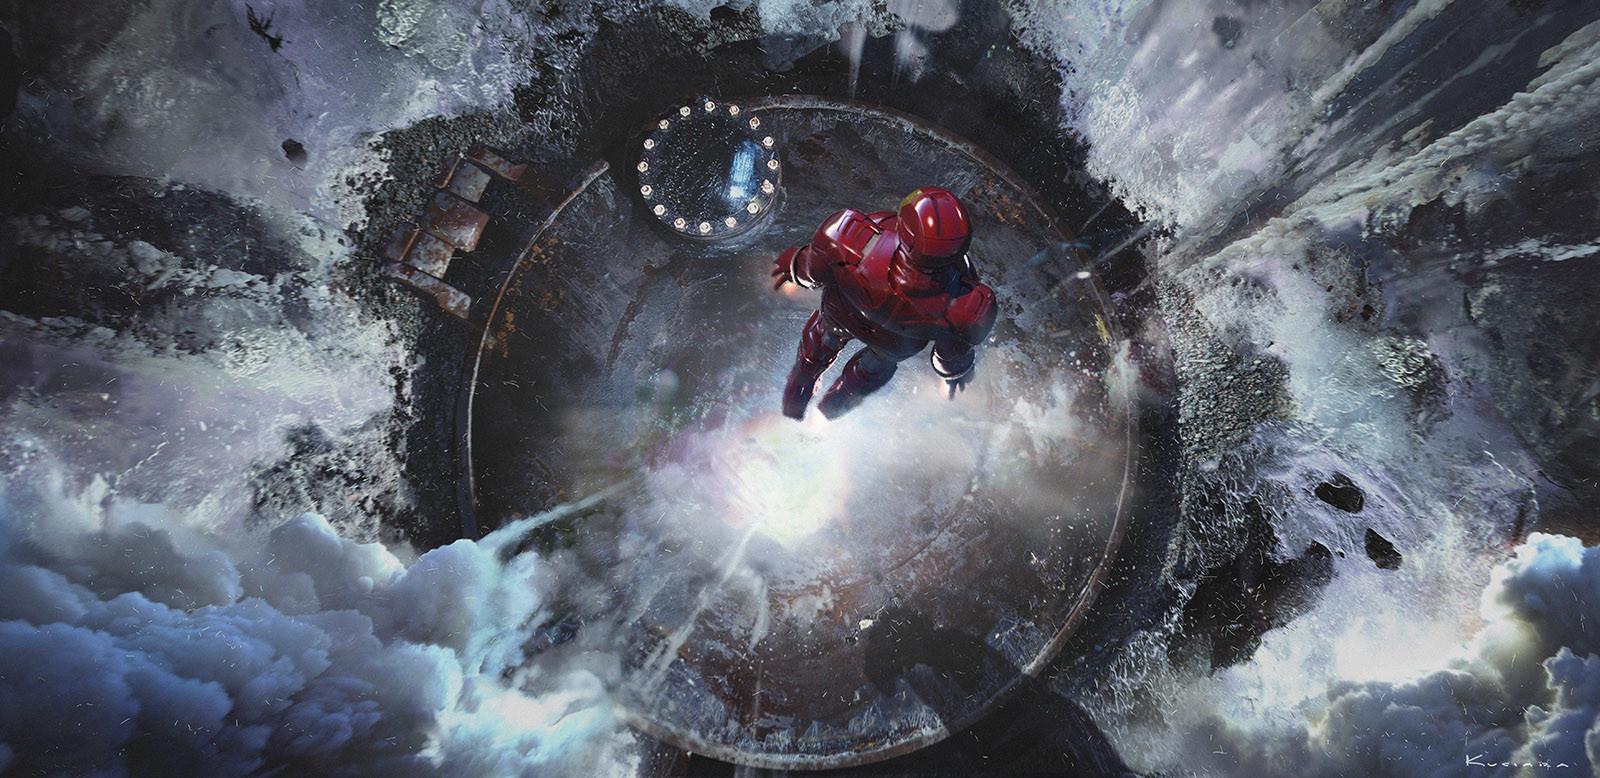 Maciej kuciara sputnik hydra facility ironman meltingsilo 01 mk 101714